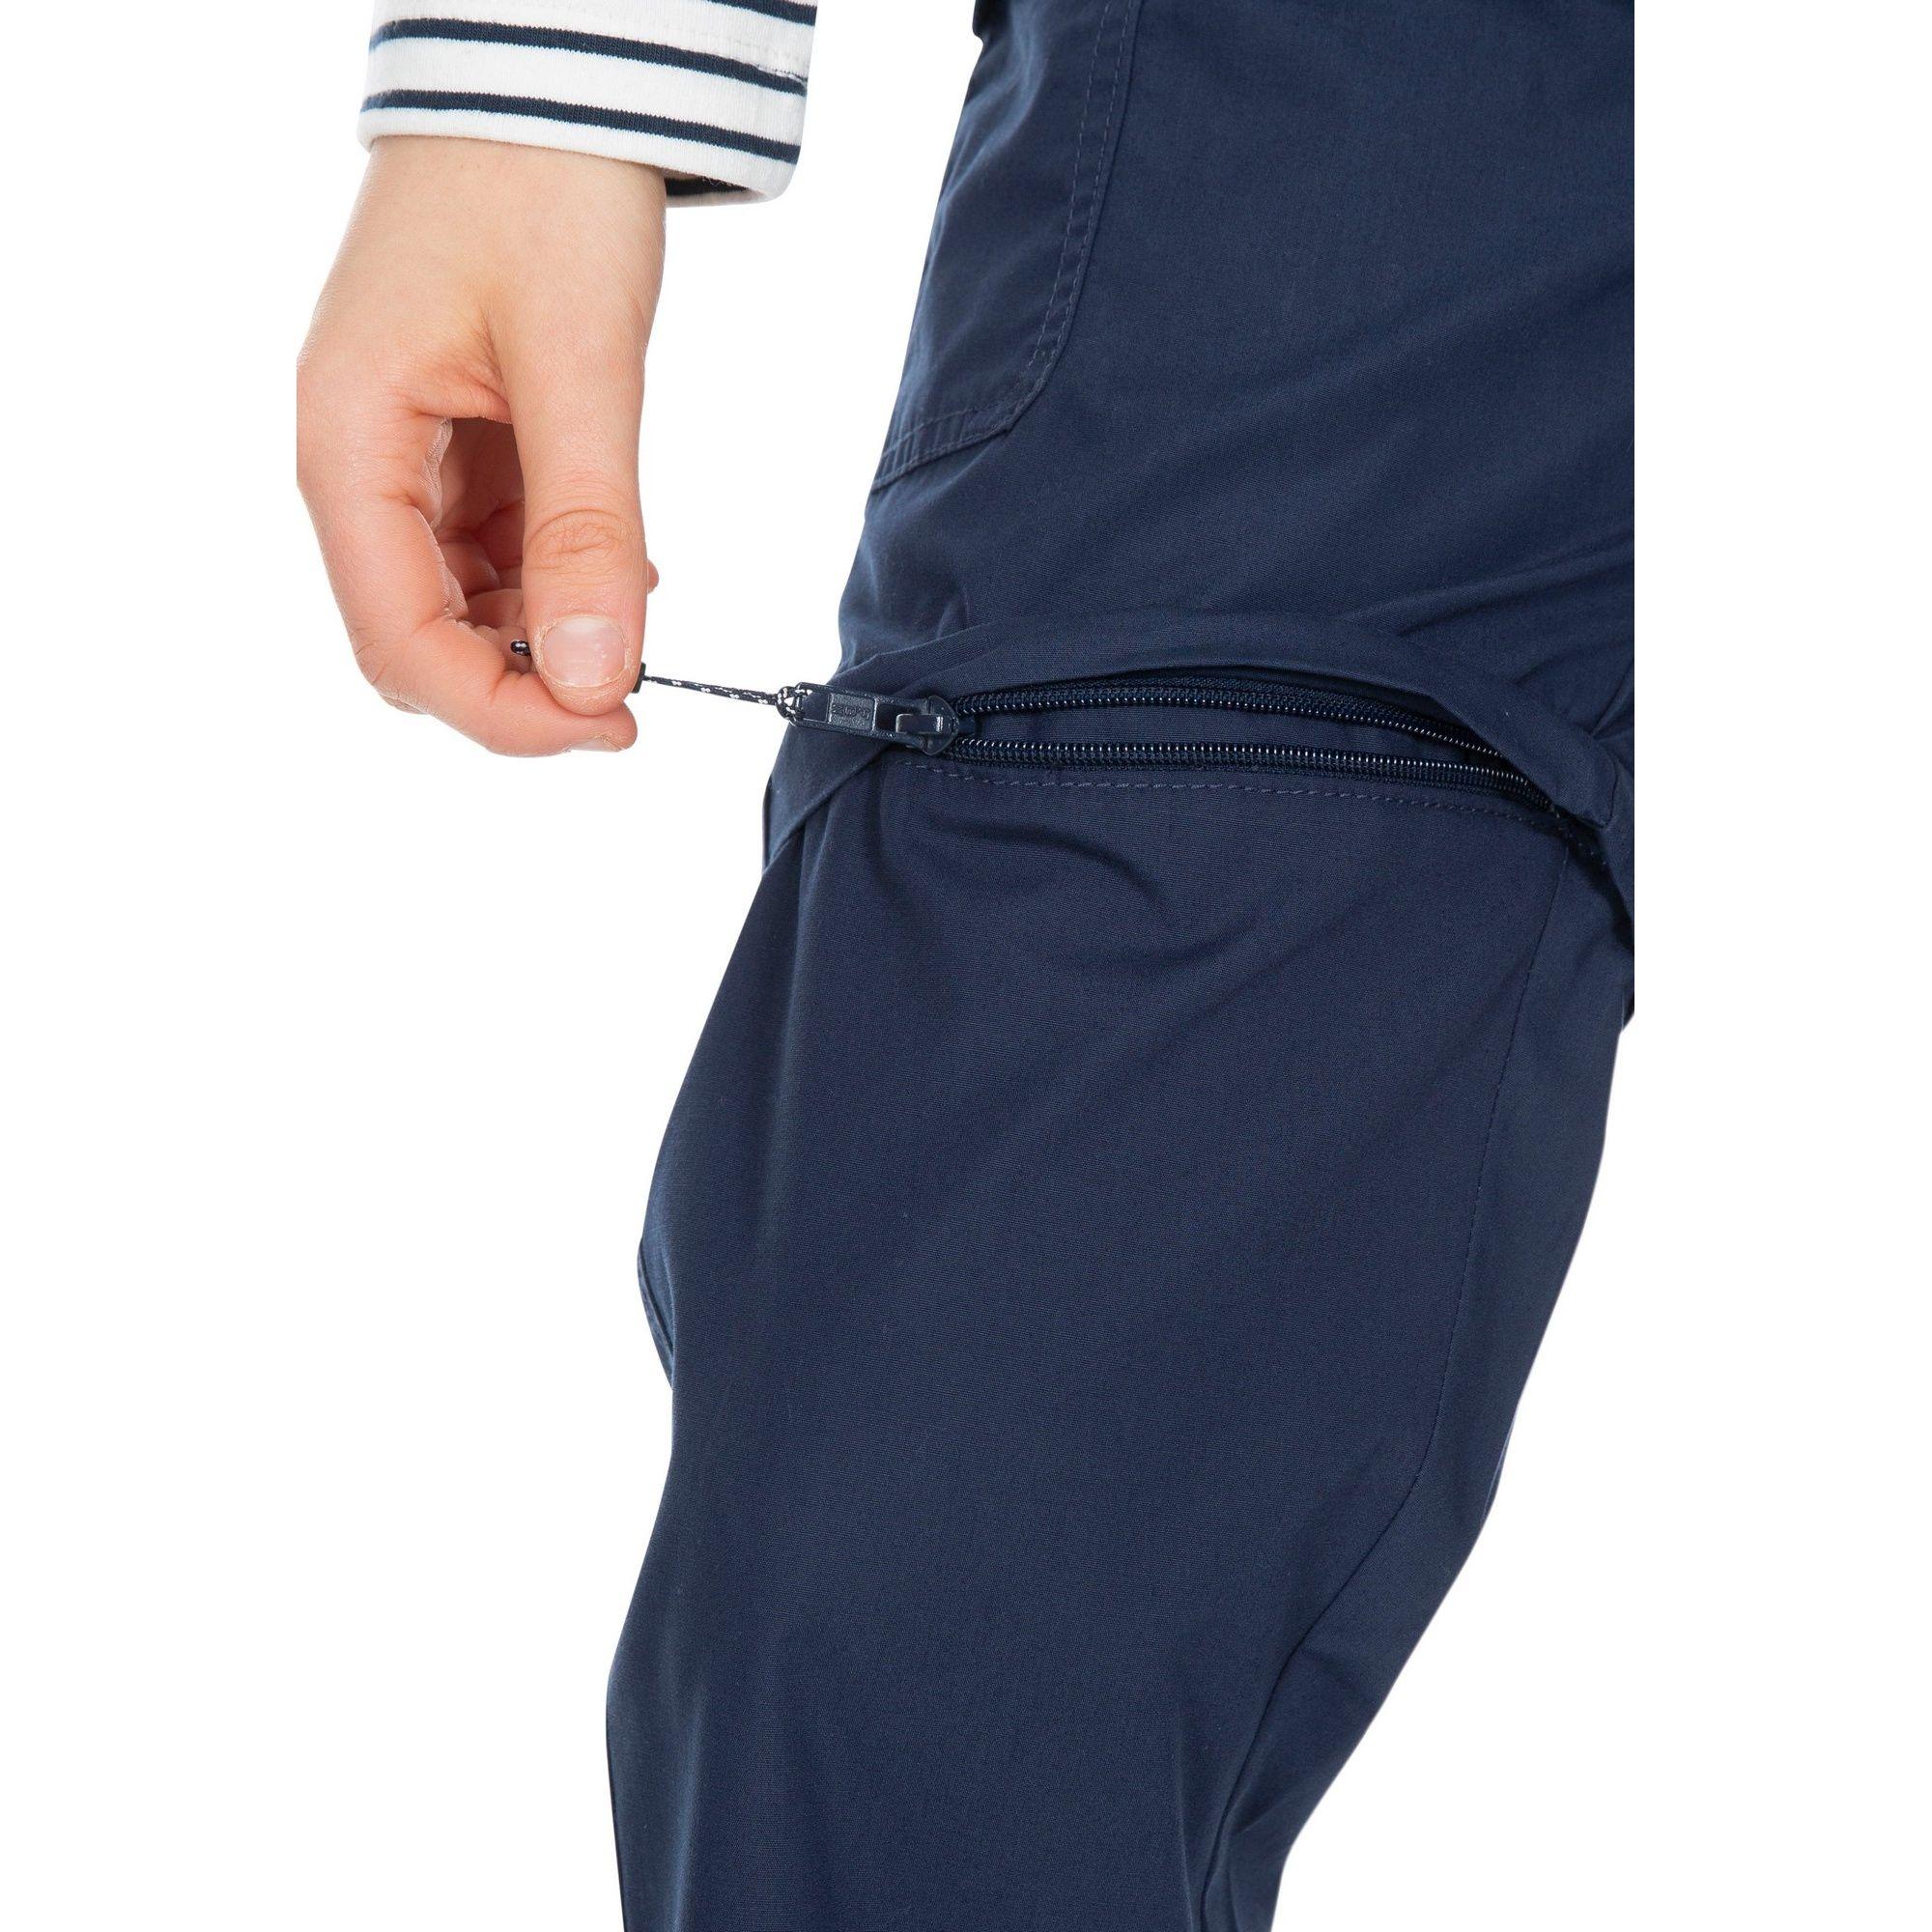 Trespass Womens/Ladies Rambler Convertible Hiking Trousers